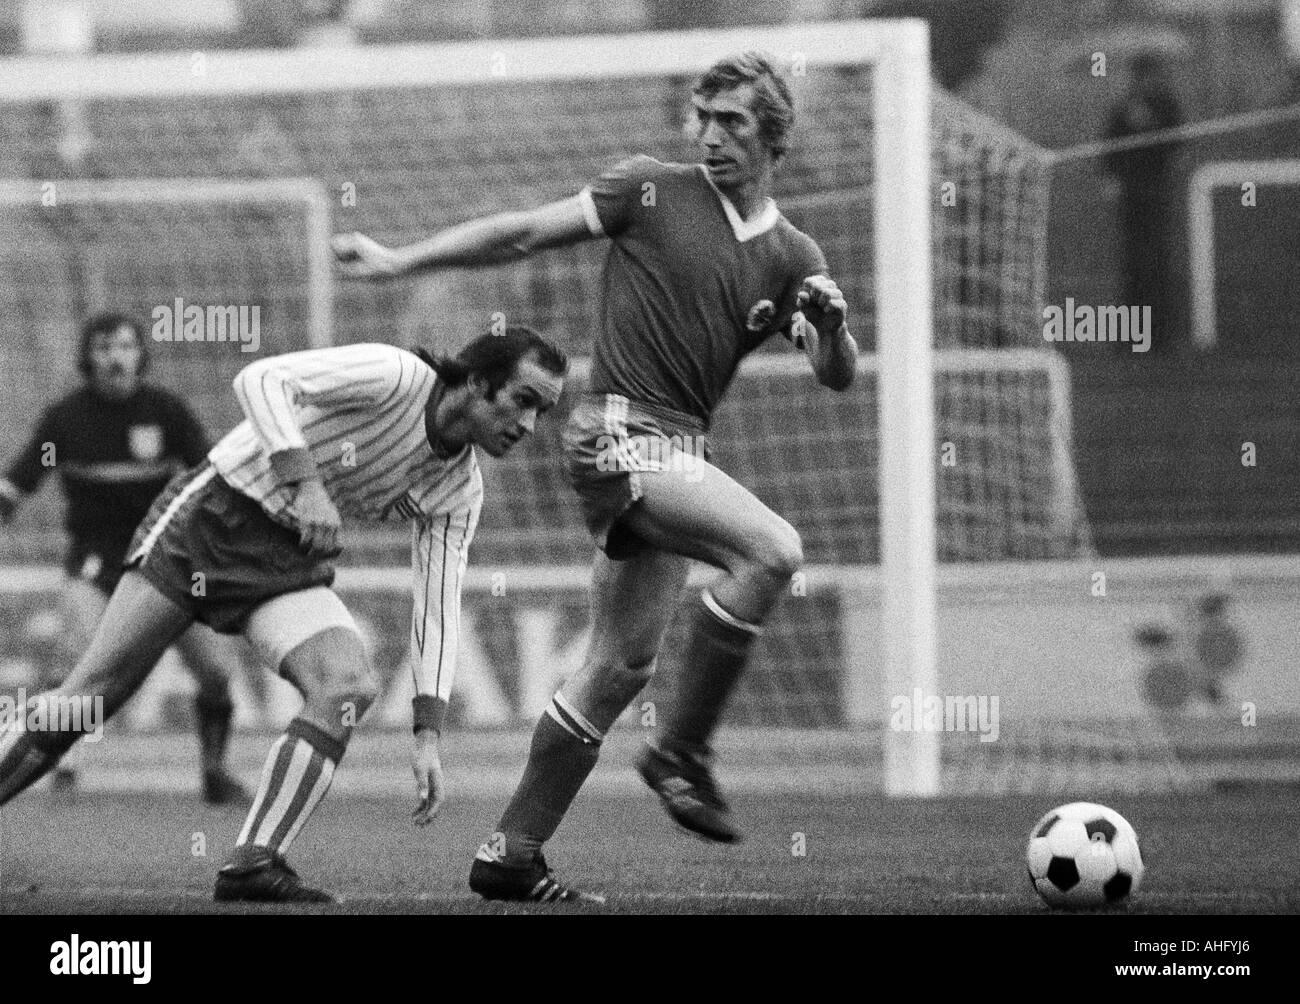 football, Regionalliga West, 1973/1974, Niederrhein Stadium in Oberhausen, Rot-Weiss Oberhausen versus Sportfreunde Siegen 3:1, scene of the match, Ditmar Jakobs (RWO) right and Guenter Thielmann (Siegen) - Stock Image